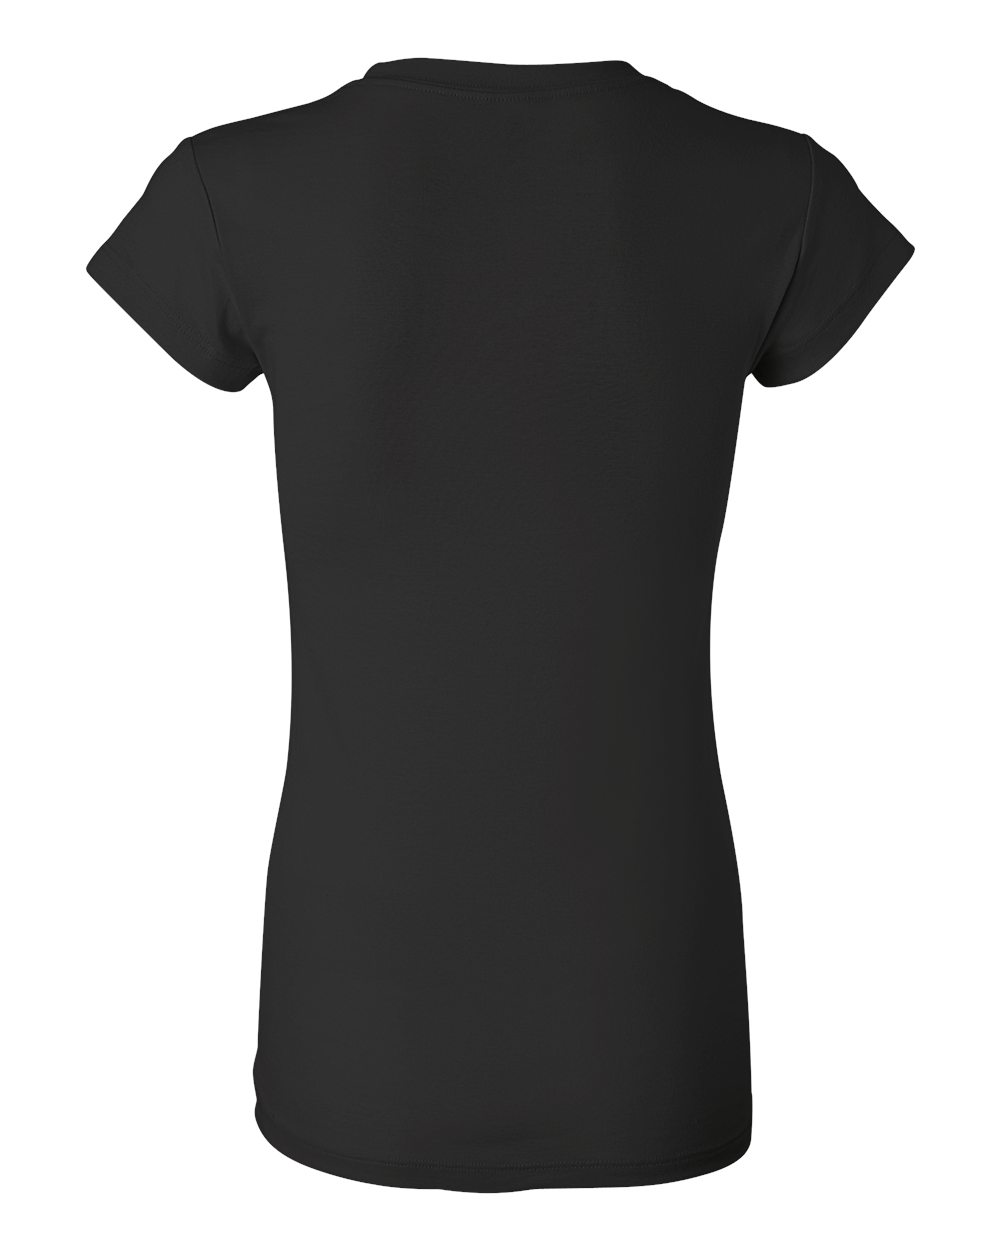 Bella-Canvas-Women-039-s-Sheer-Mini-Rib-Short-Sleeve-T-Shirt-8701-S-2XL thumbnail 4